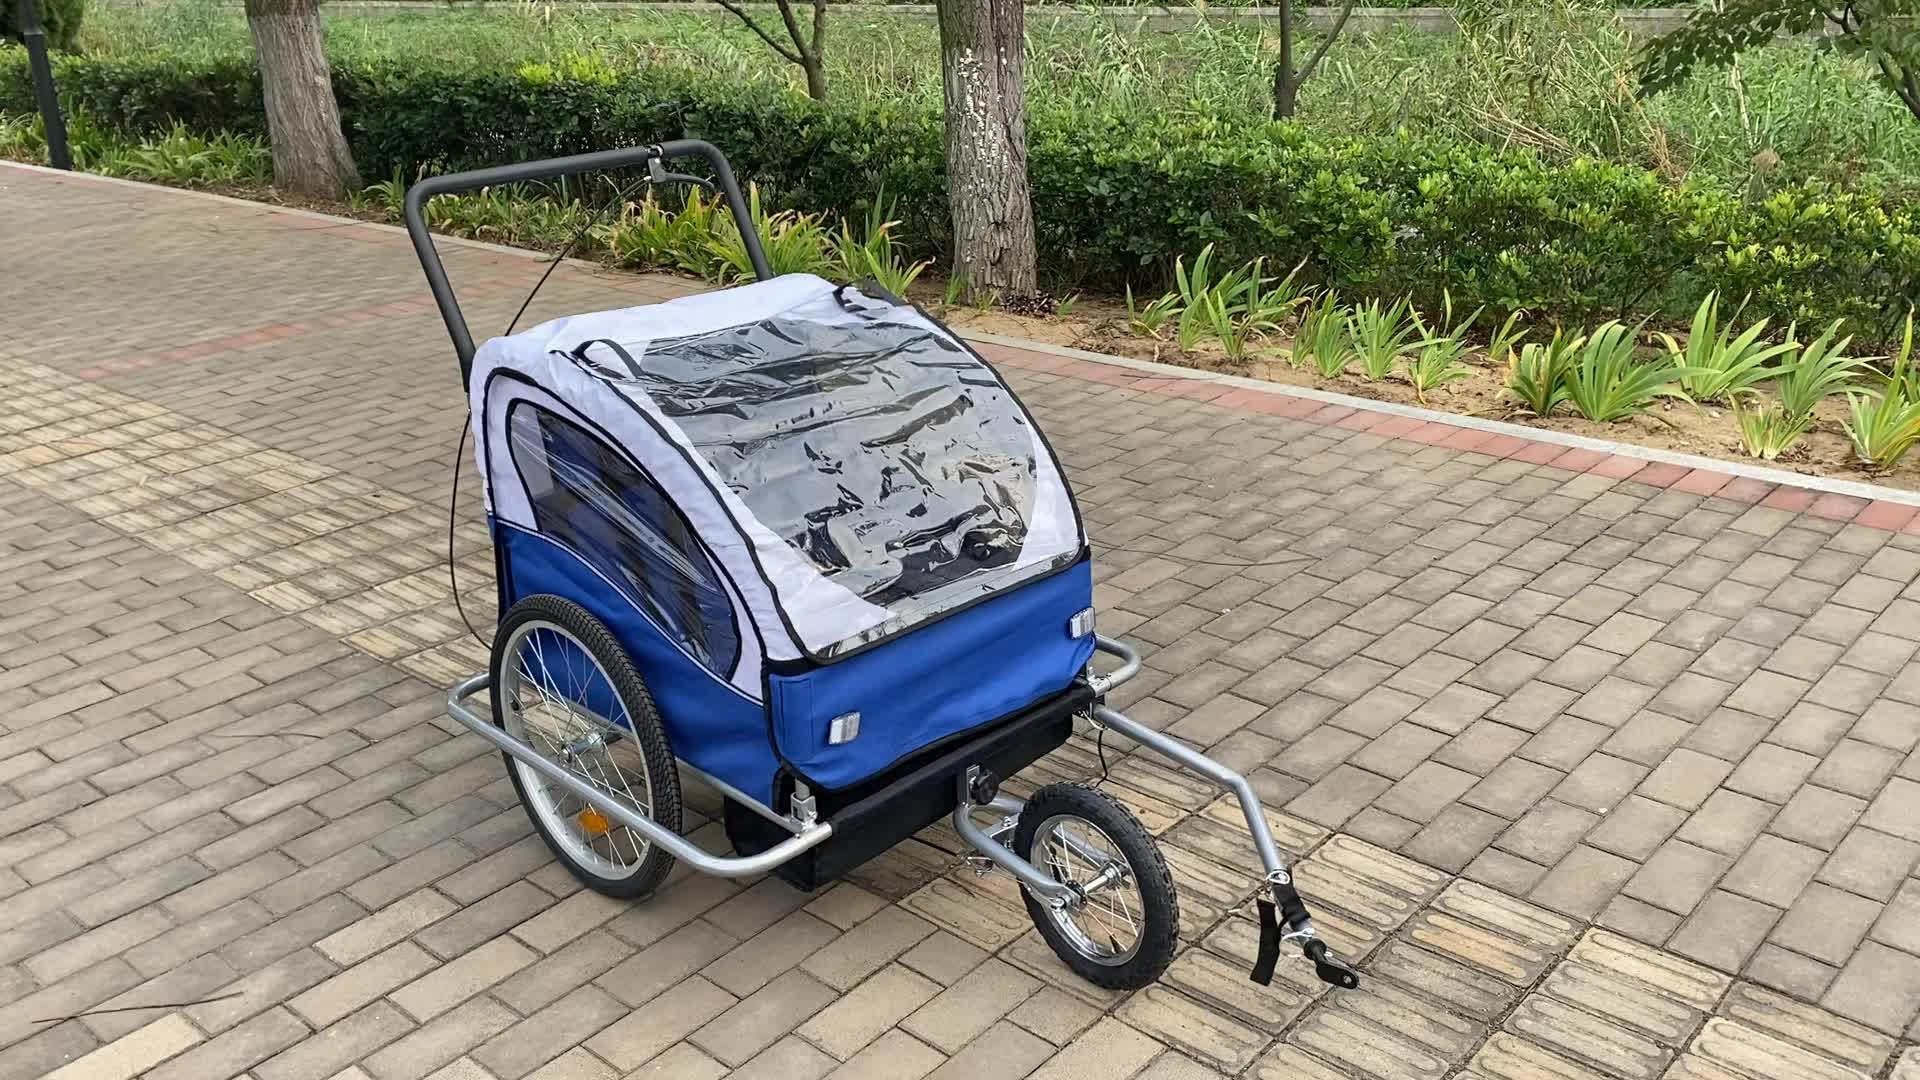 Fabrik Angepasst Freien Transport Folding Jogger Baby Kinderwagen 2 Sitz Utility Fahrrad Bike Kind Träger Anhänger